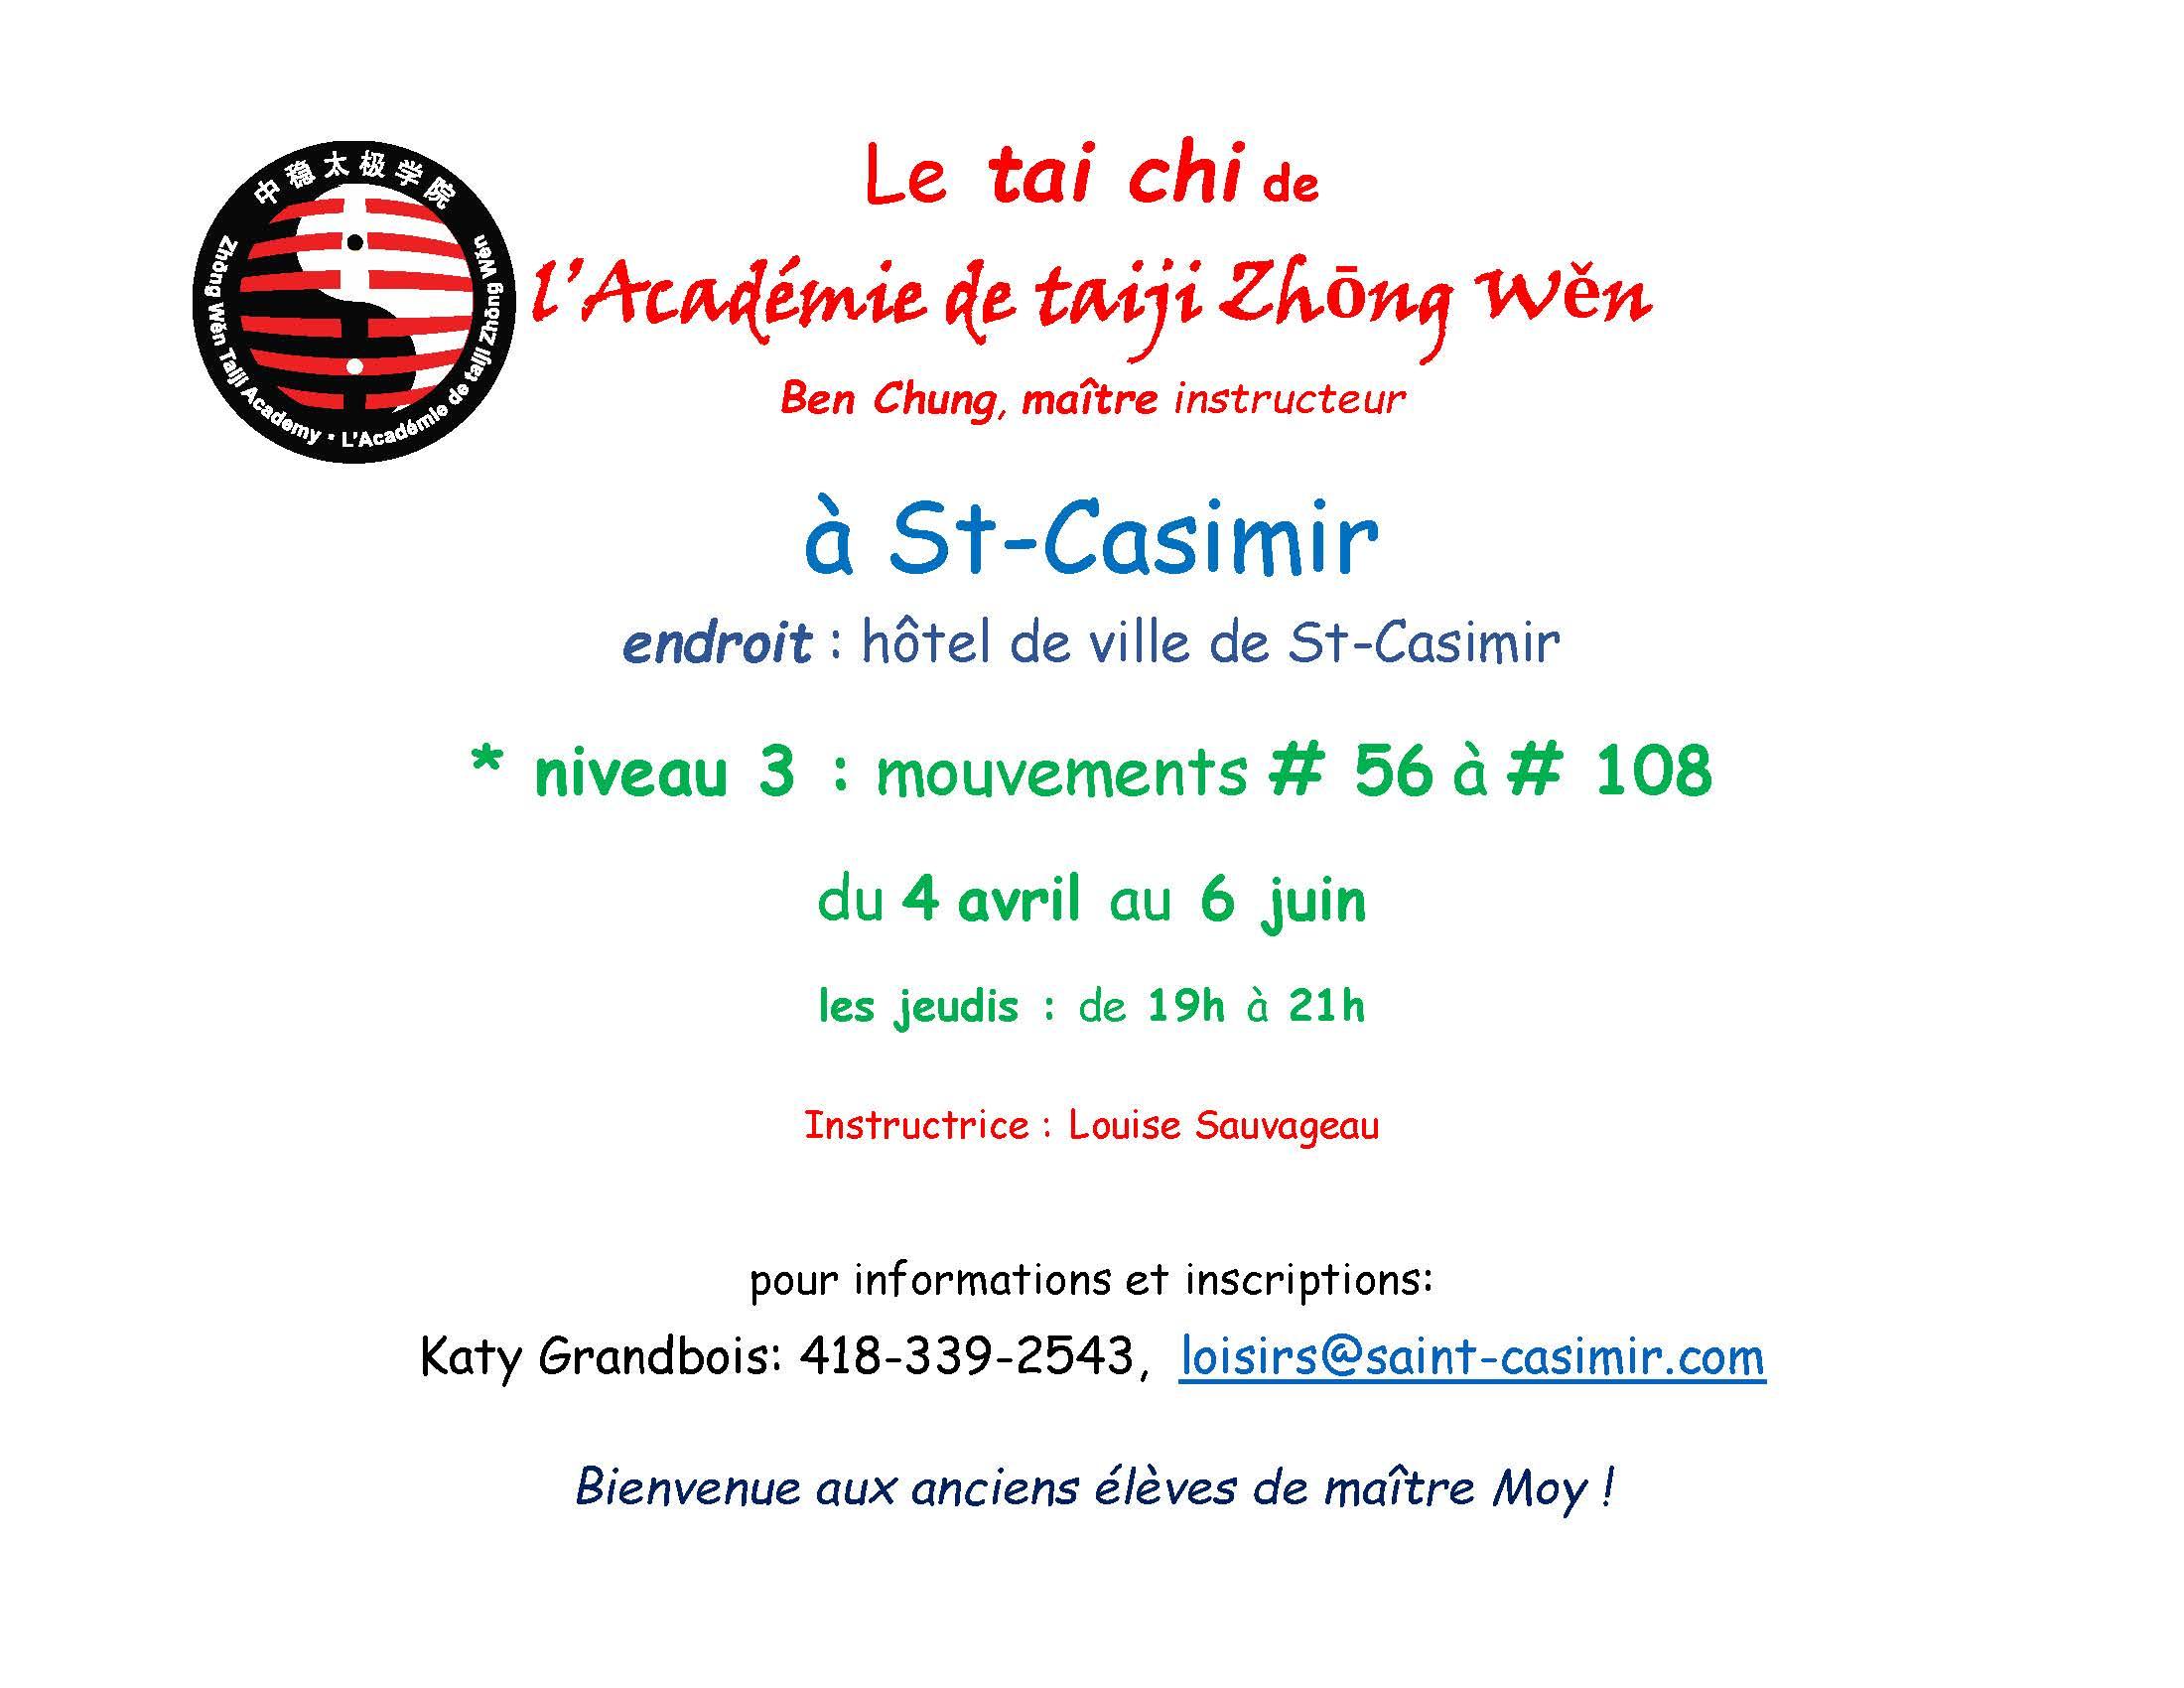 St-Casimir-2019-04-niveau 3.jpg